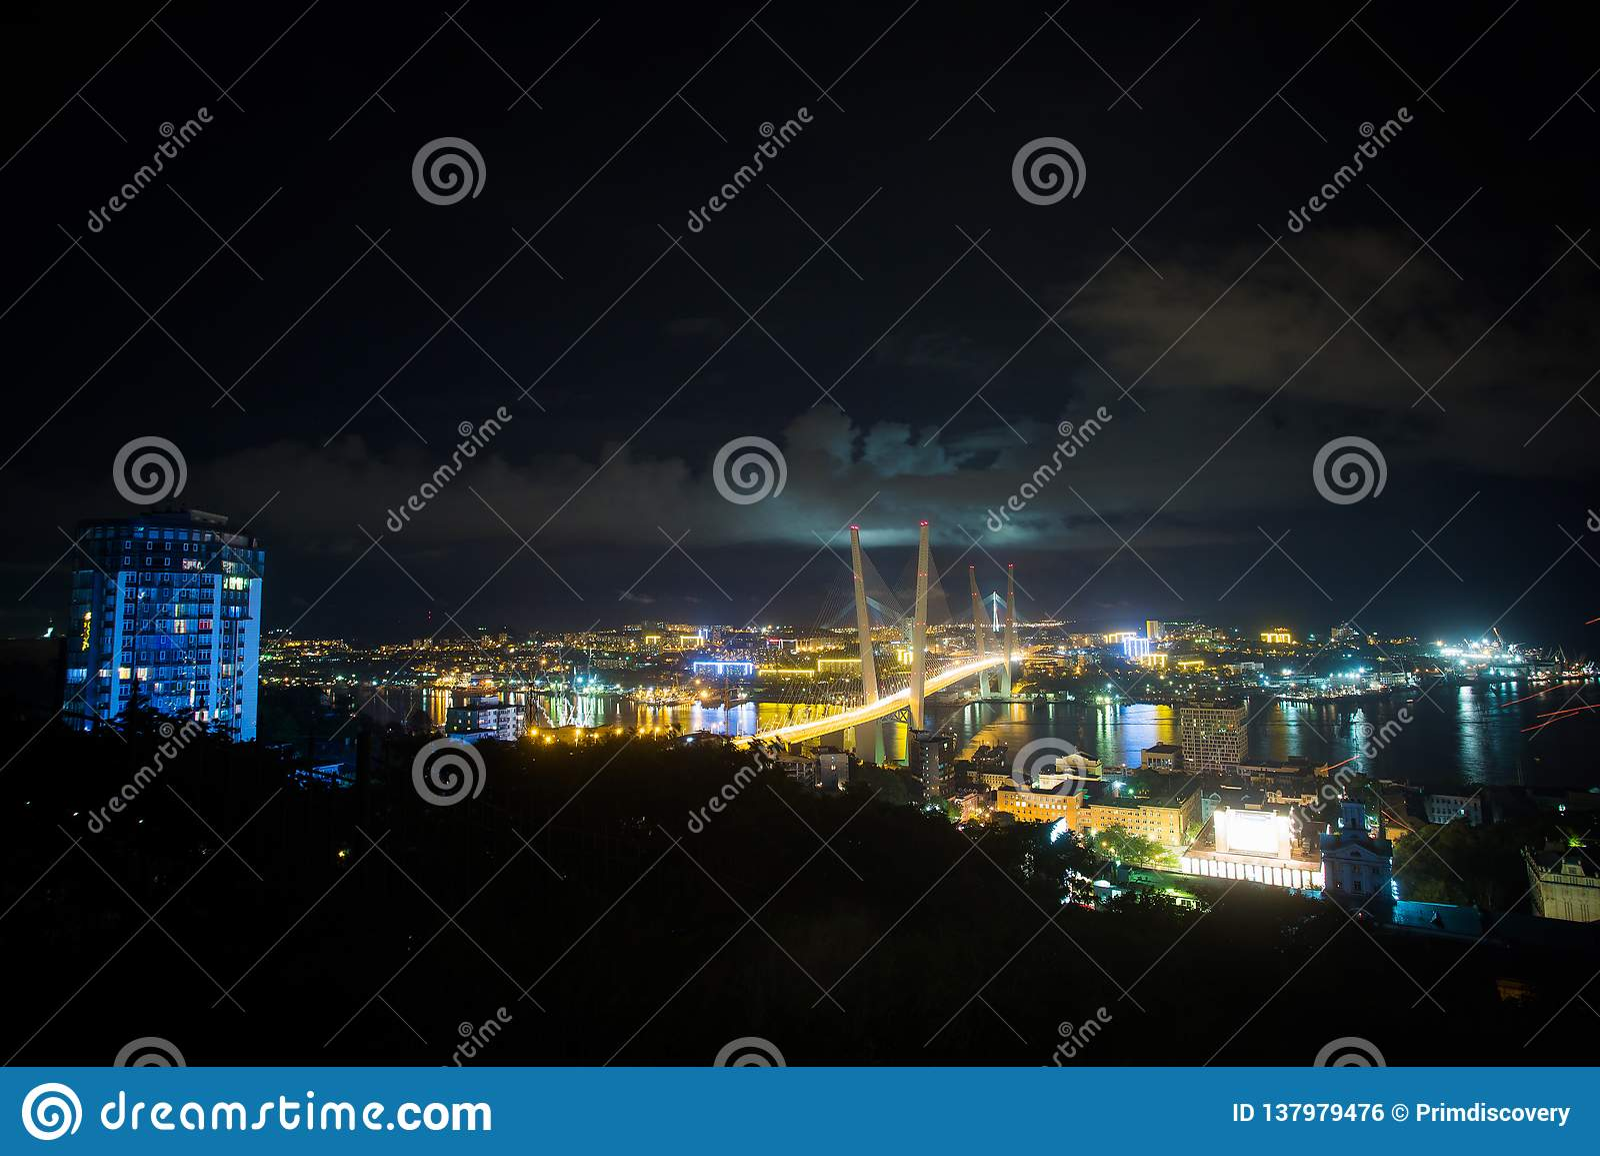 Zolotoy den guld- bron är denblivna bron över Zolotoyen Rog Golden Horn i Vladivostok, Ryssland